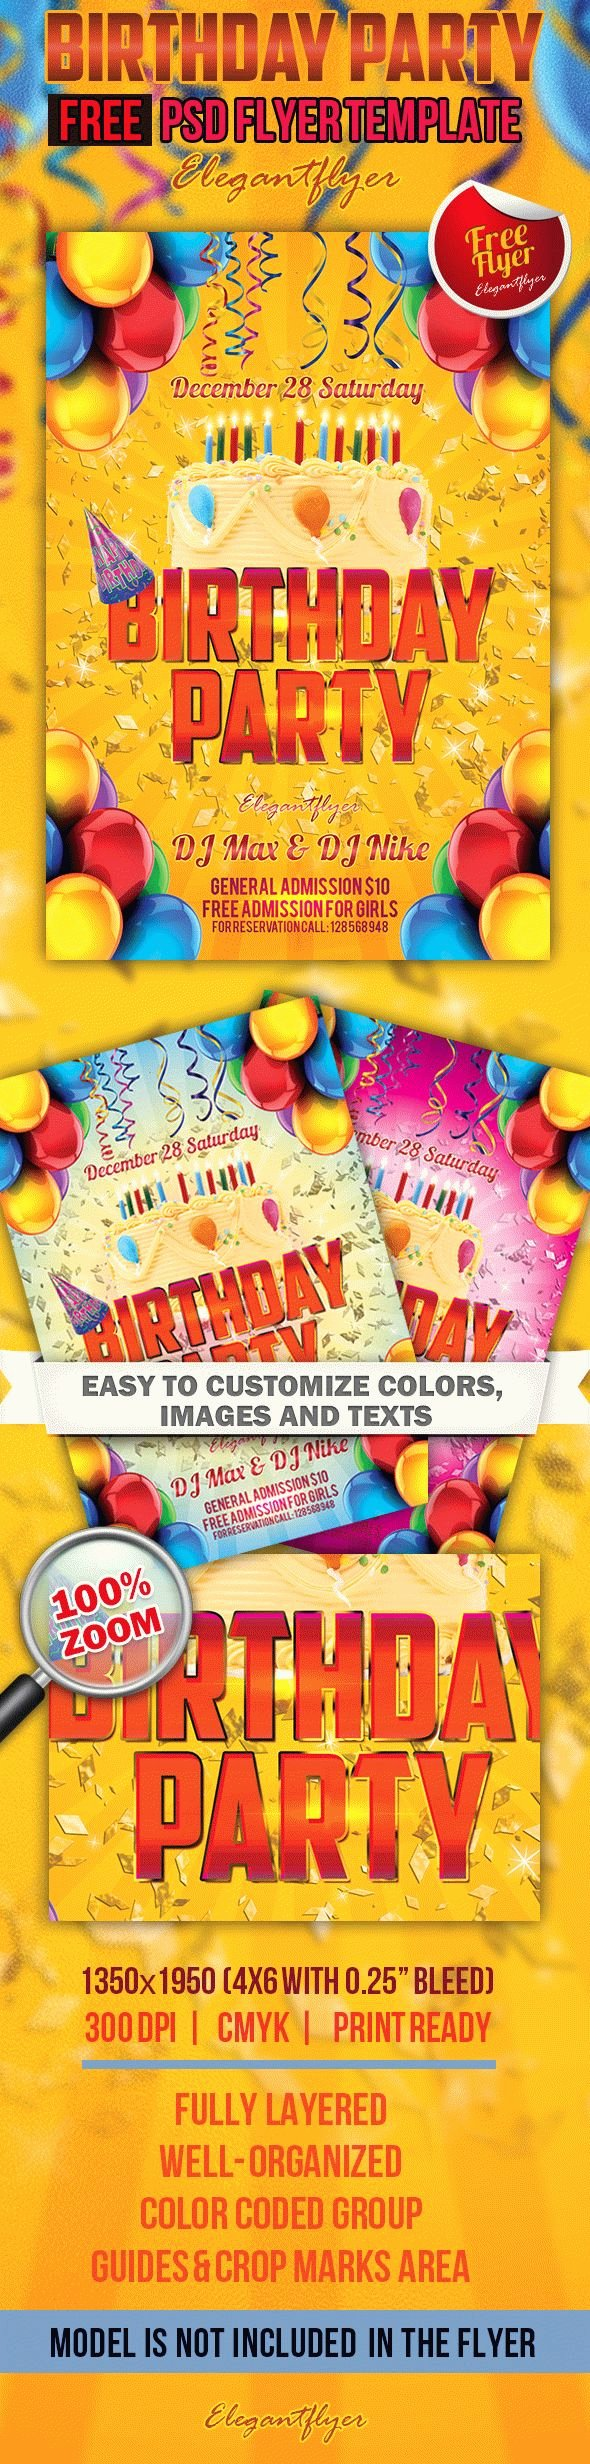 Birthday Flyer Template Free Best Of Birthday Party Free Flyer Template – by Elegantflyer